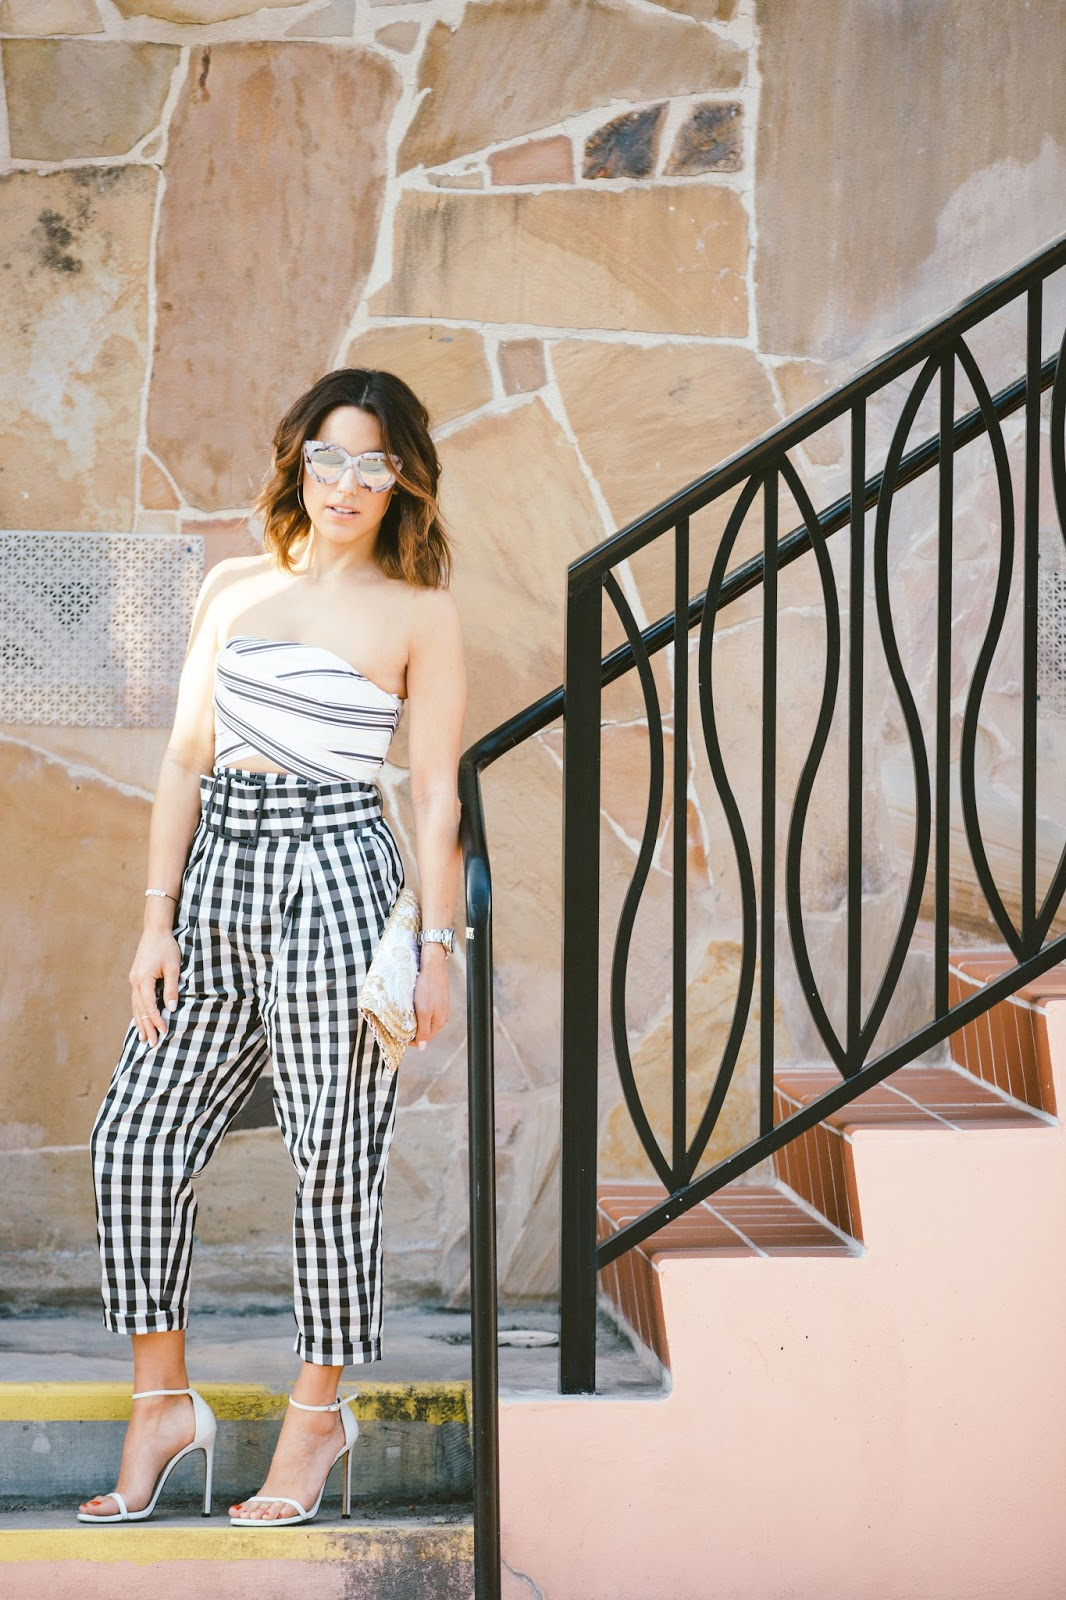 gingham-trousers-fashion-blogger-kelly-saks